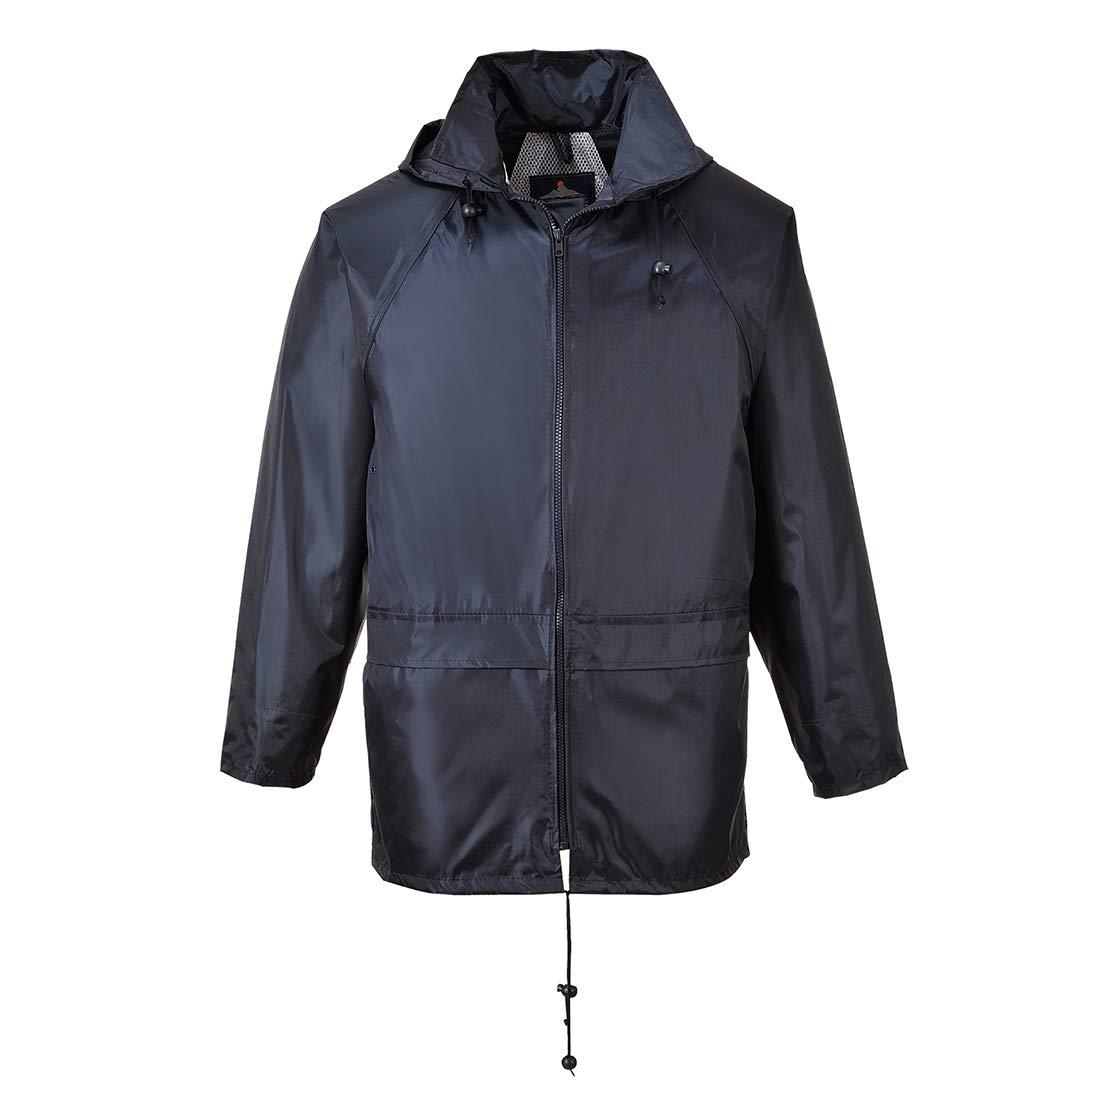 Portwest US440 Classic Waterproof Rain Jacket wth Pack Away Hood & Sealed Seams, Navy, XXL